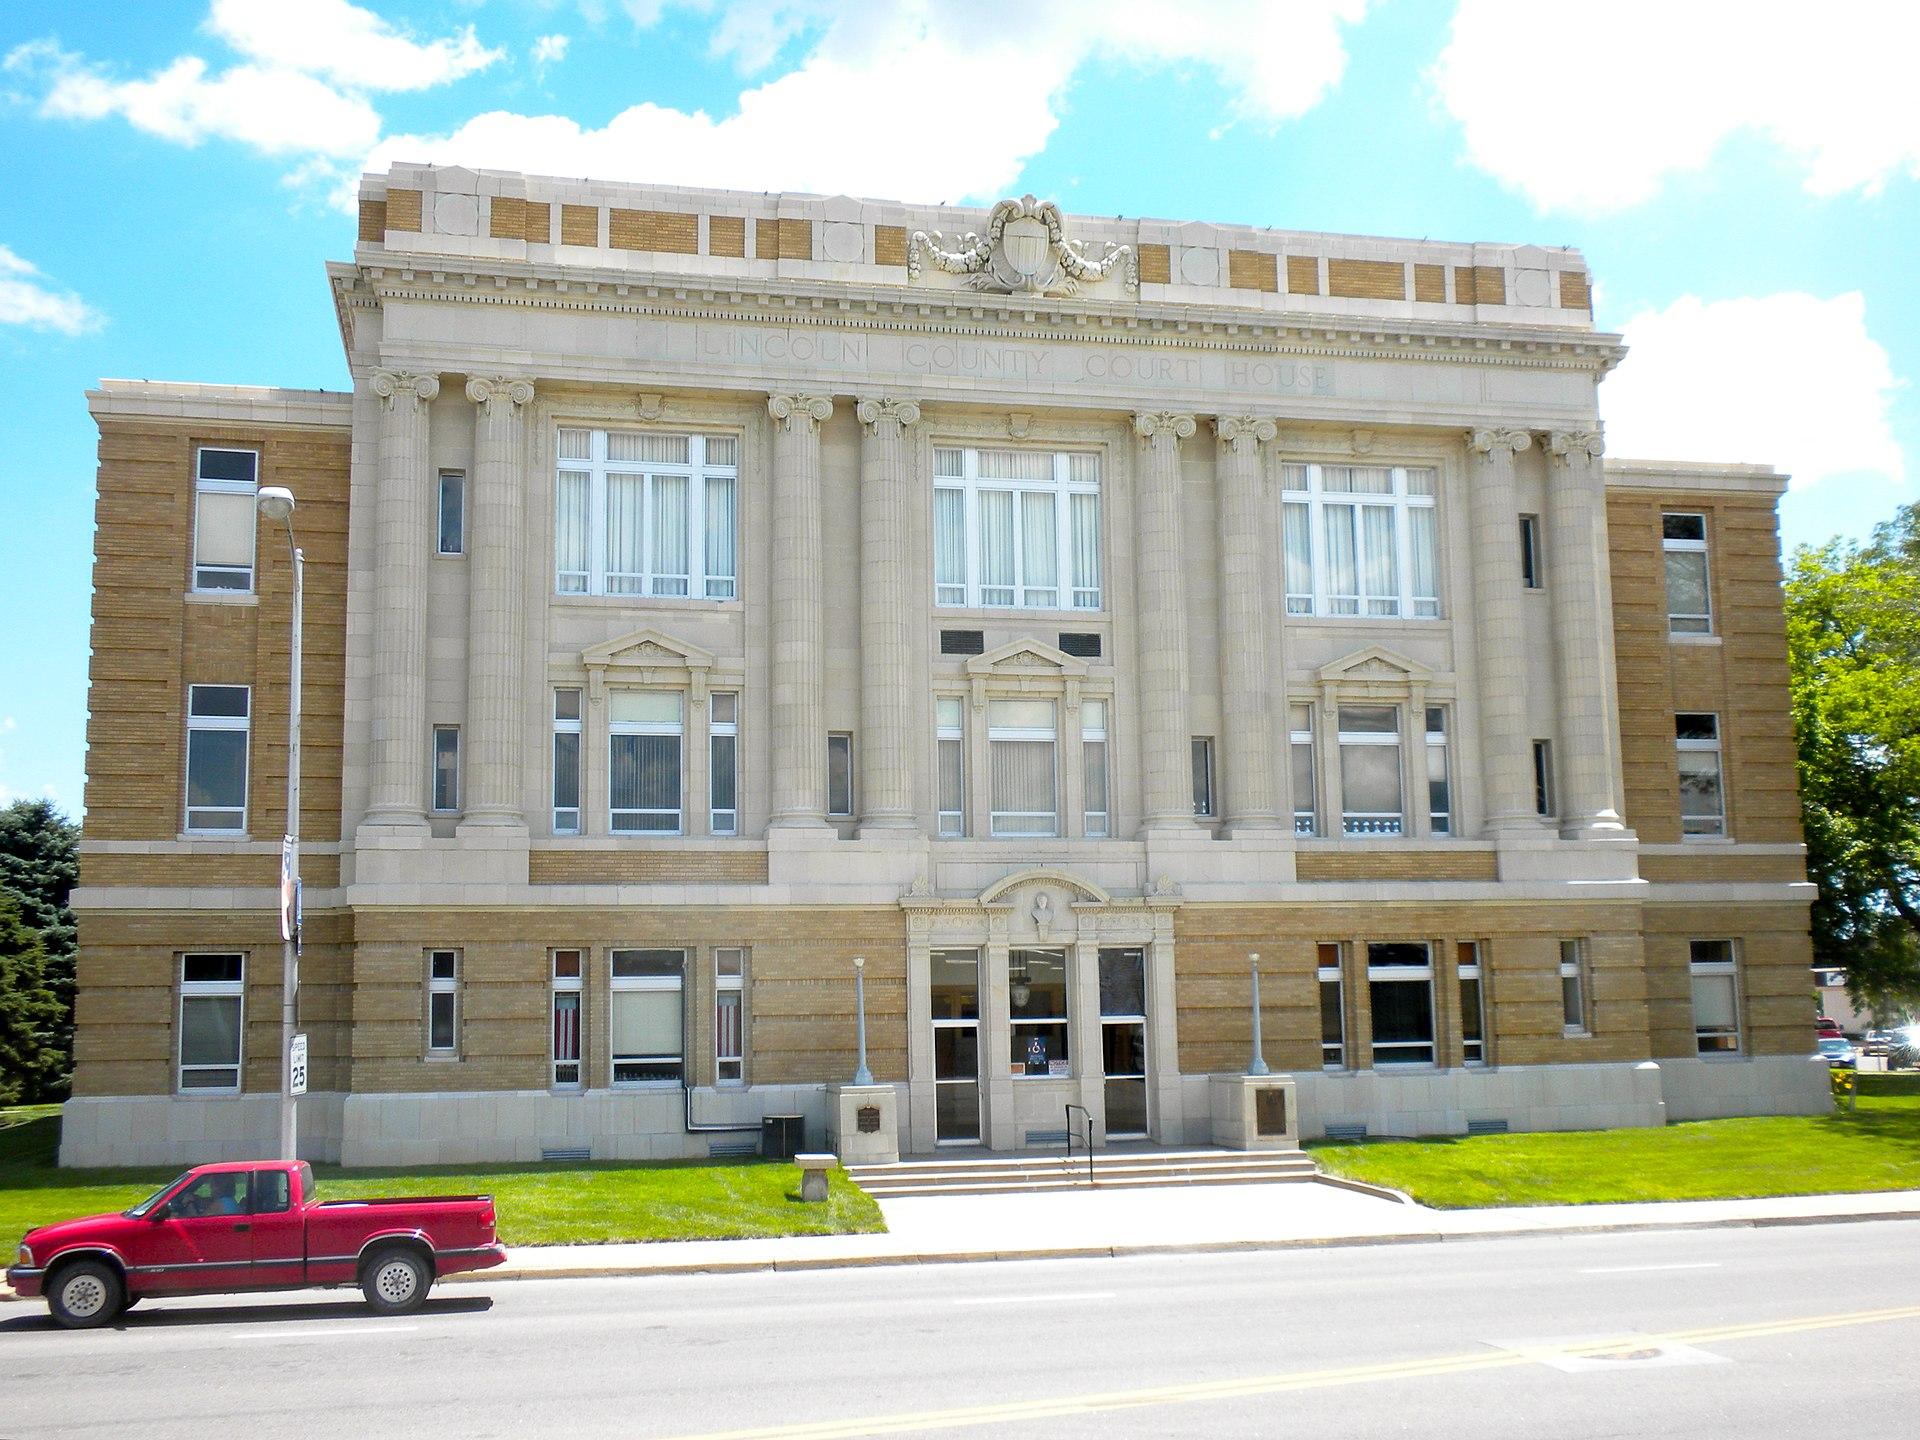 lincoln county nebraska wikipedia